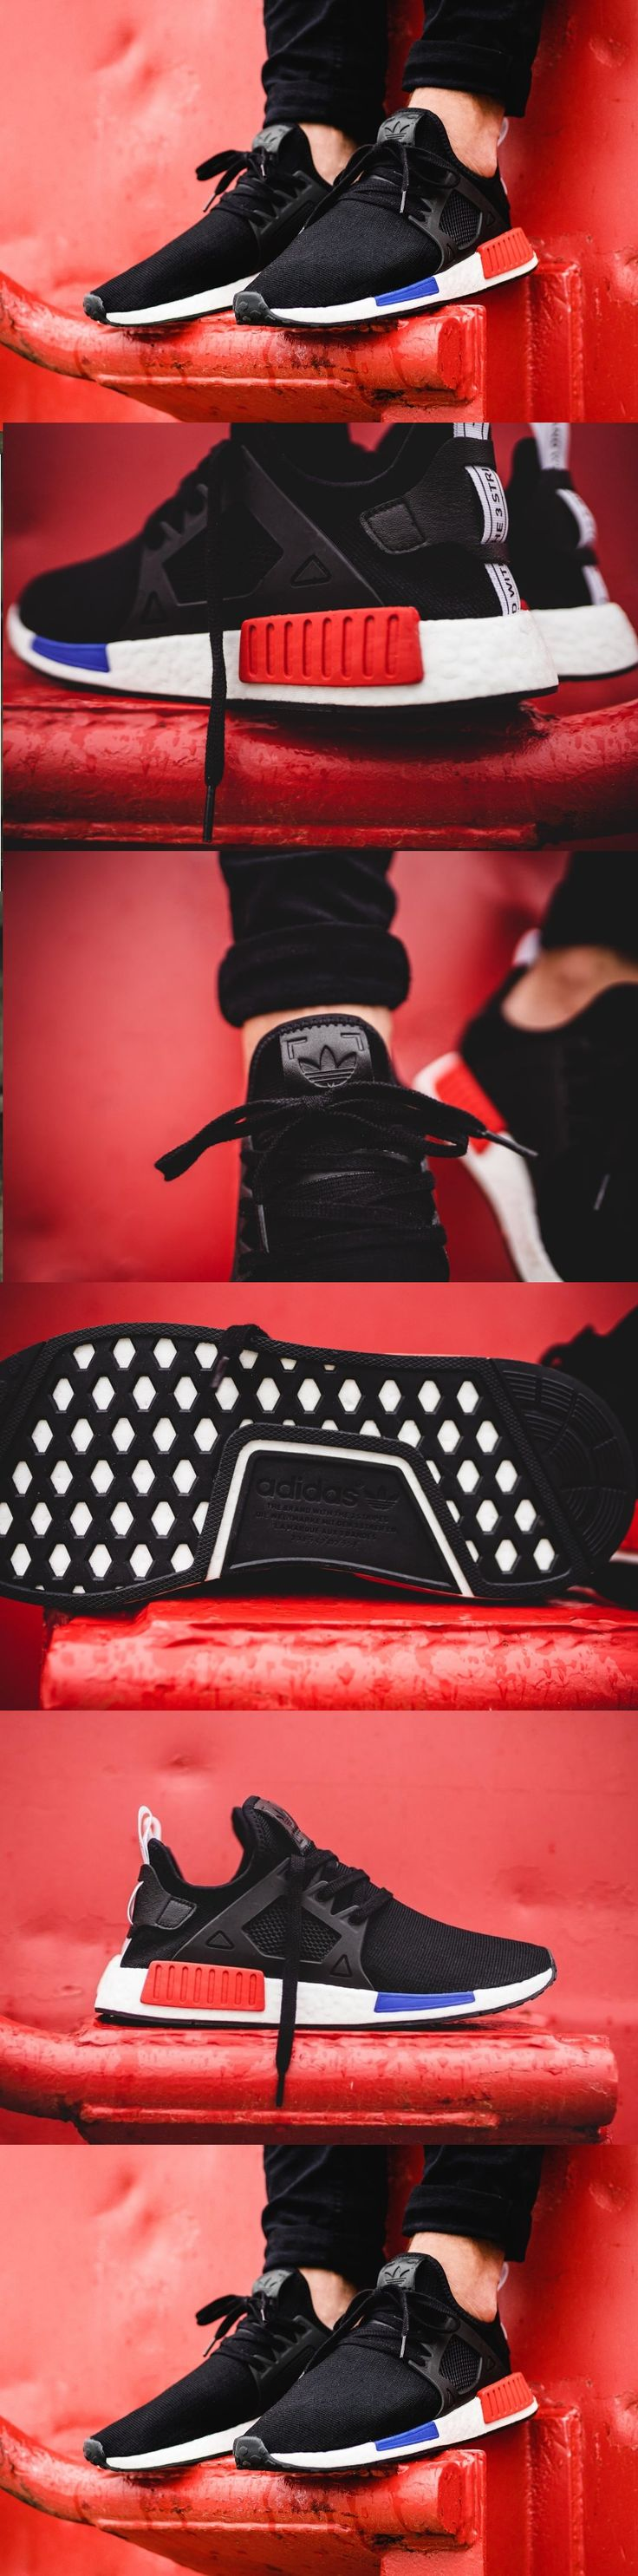 #Adidas #NMD #XR1 #Primeknit 'OG' #Black #Red #Blue http://www.adidas.fr/chaussure-nmd_xr1/BY1909.html?cm_mmc=AdieAffiliates_PHG-_-sneakersactus-_-home-_-bs-&cm_mmca1=FR&dclid=COPUkpntg9QCFZbjGwodyMUOjw